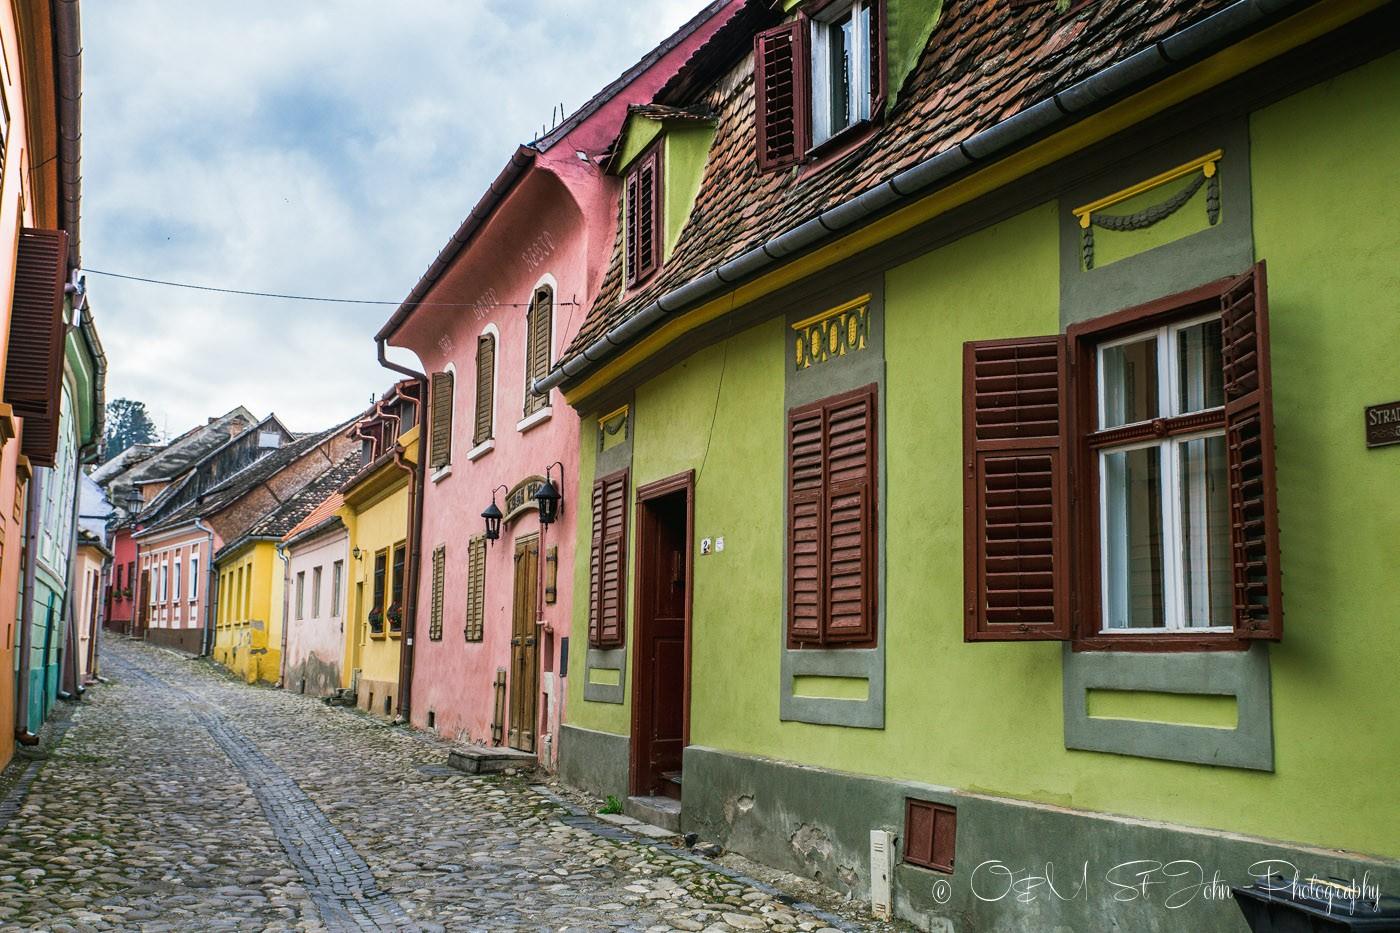 Colourful houses in Sighisoara, Romania